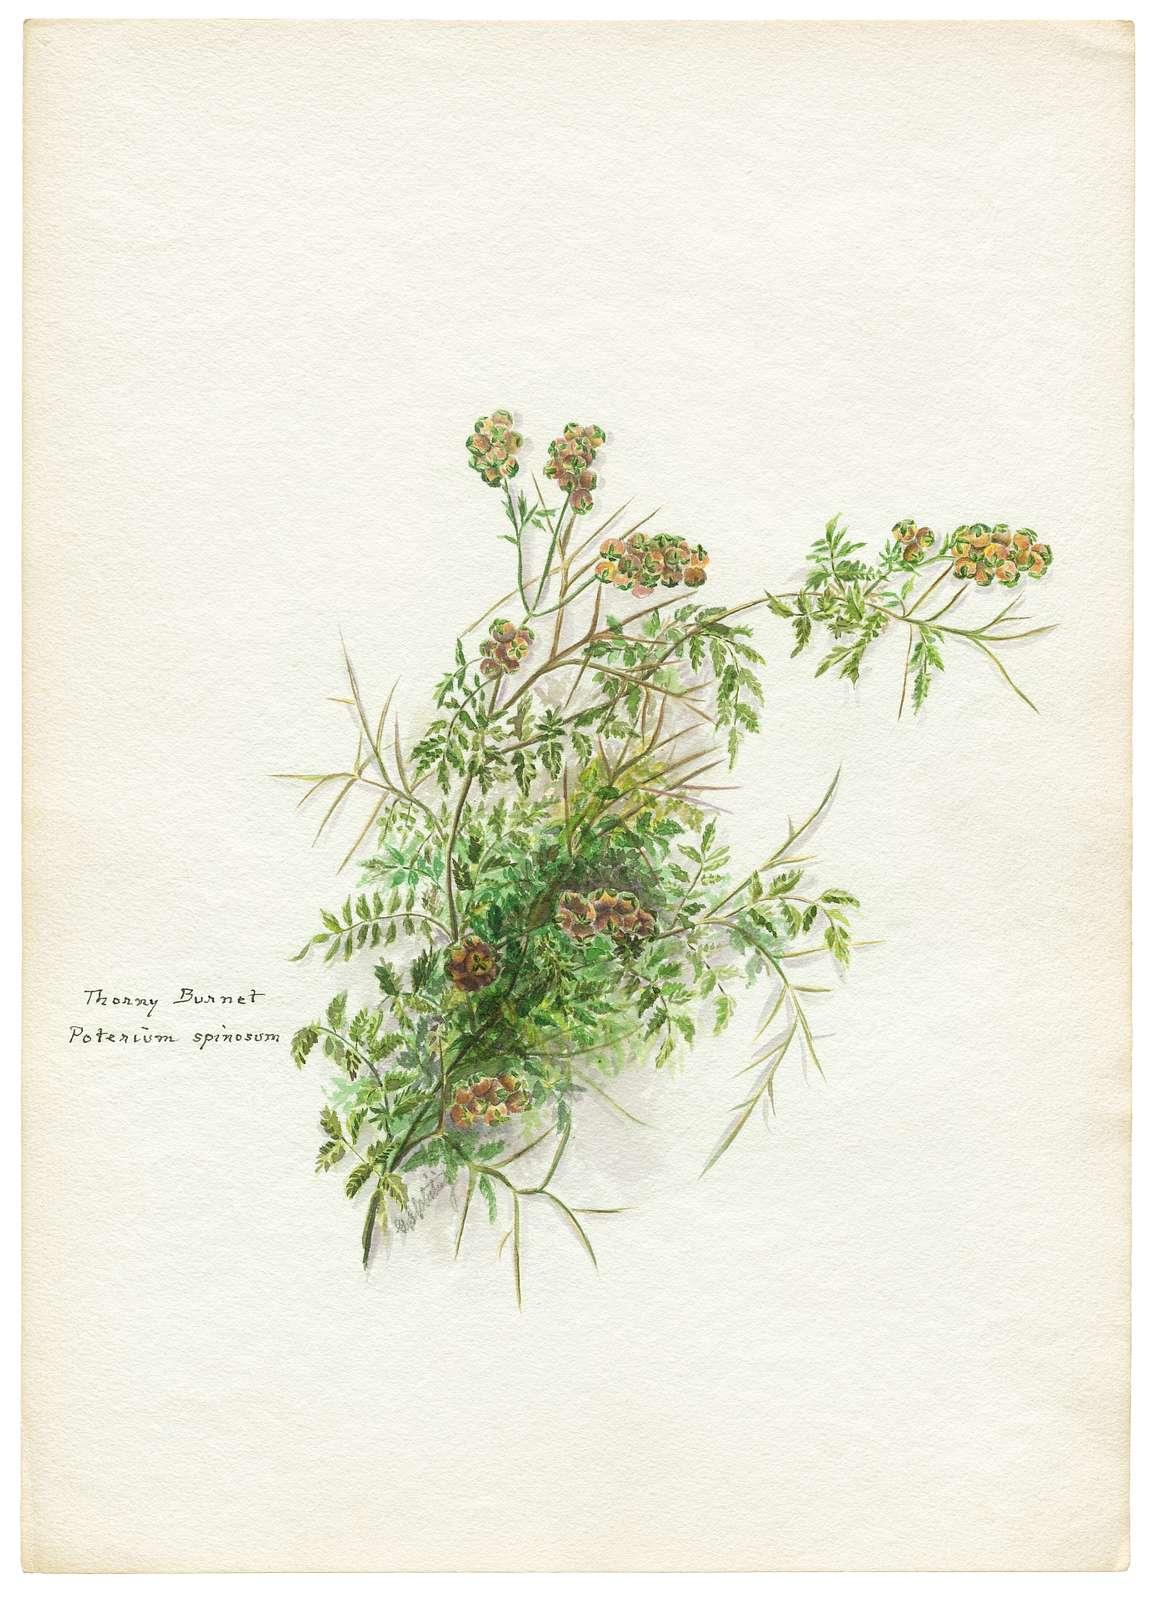 Thorny burnet, Poterium Spinosum / G.S. Whiting.